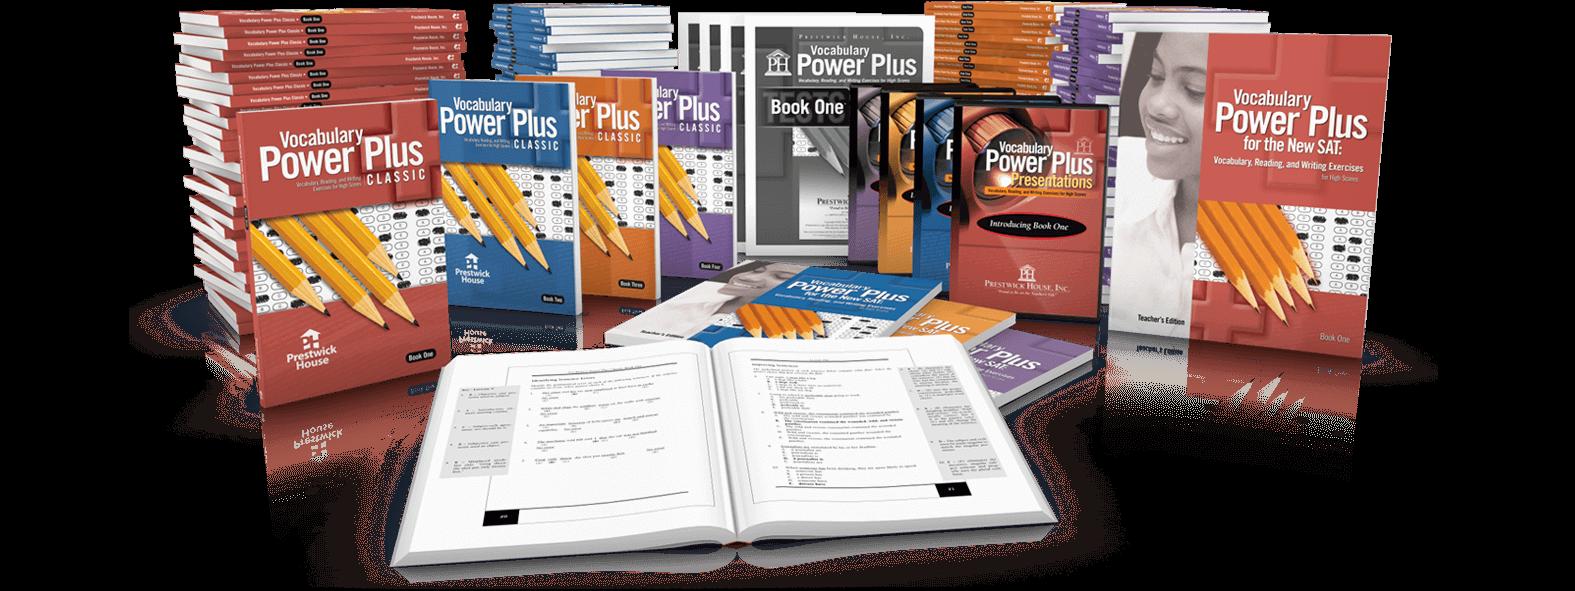 28 j weston walch publisher worksheets answers - 16 best ...